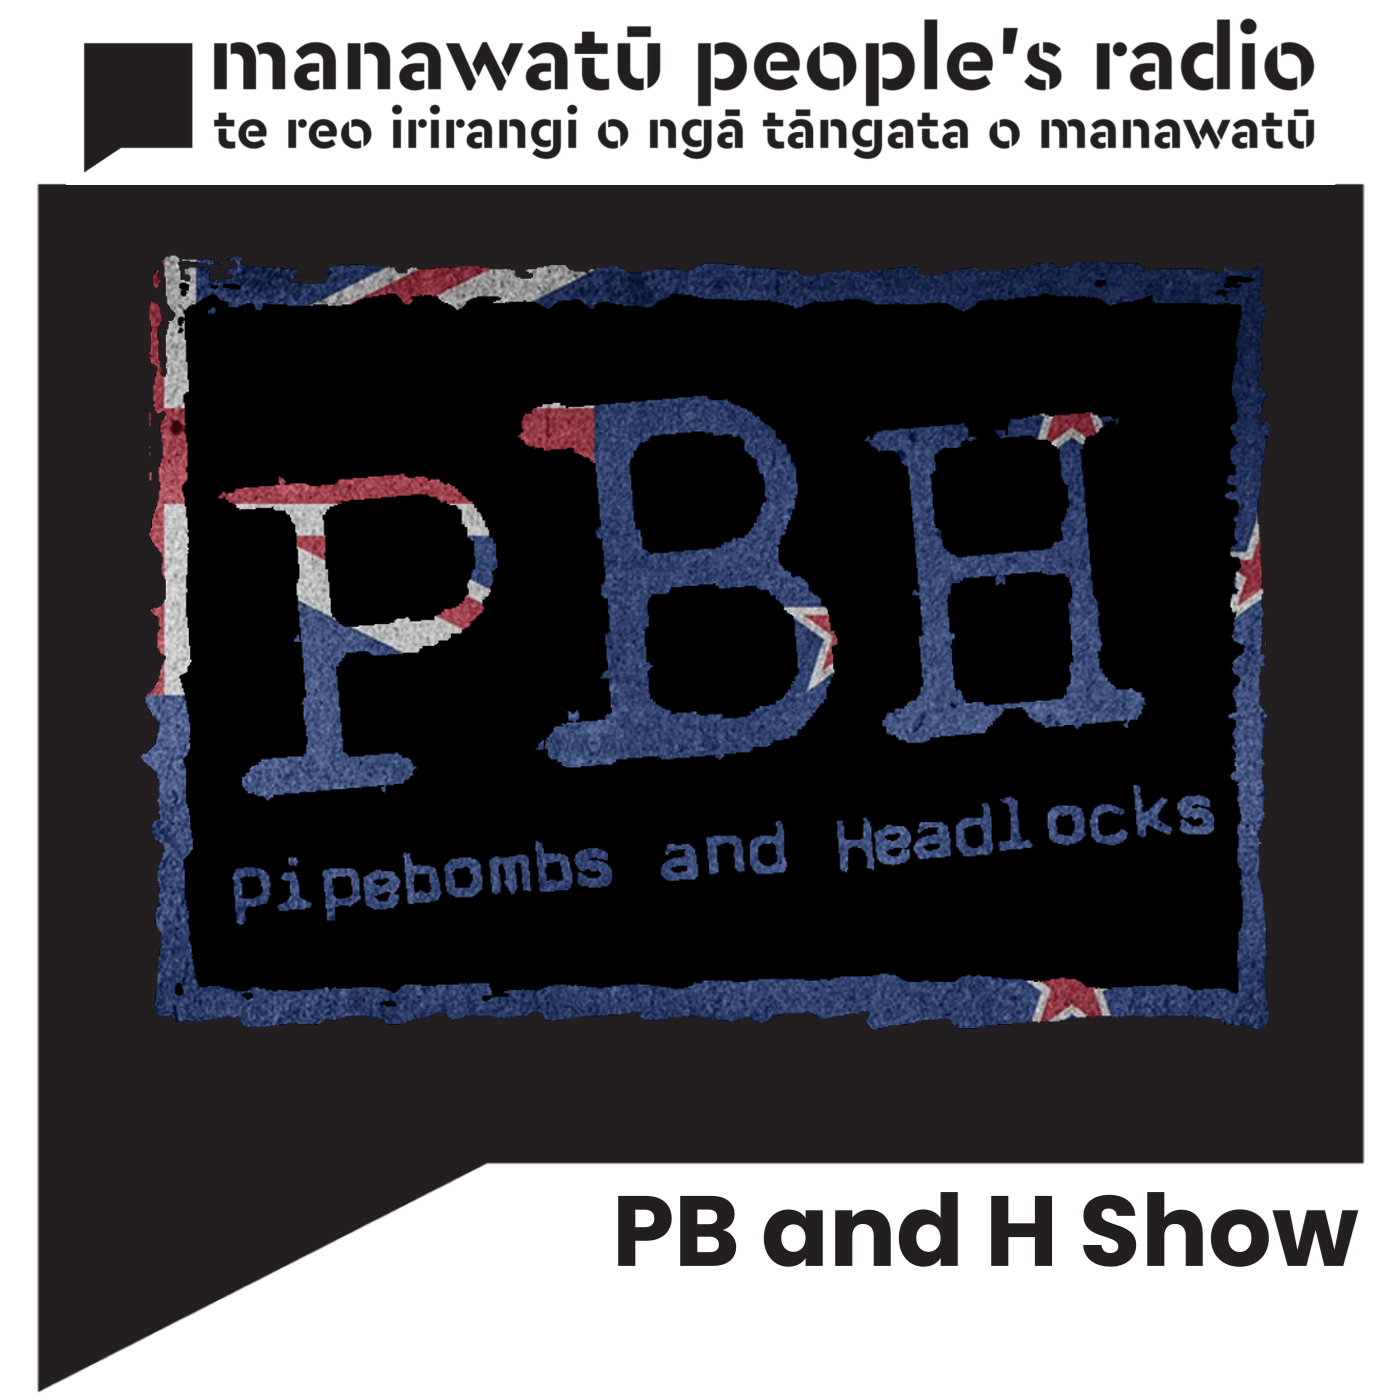 https://static.accessradio.org/StationFolder/manawatu/Images/MPR - PBandHShow.png